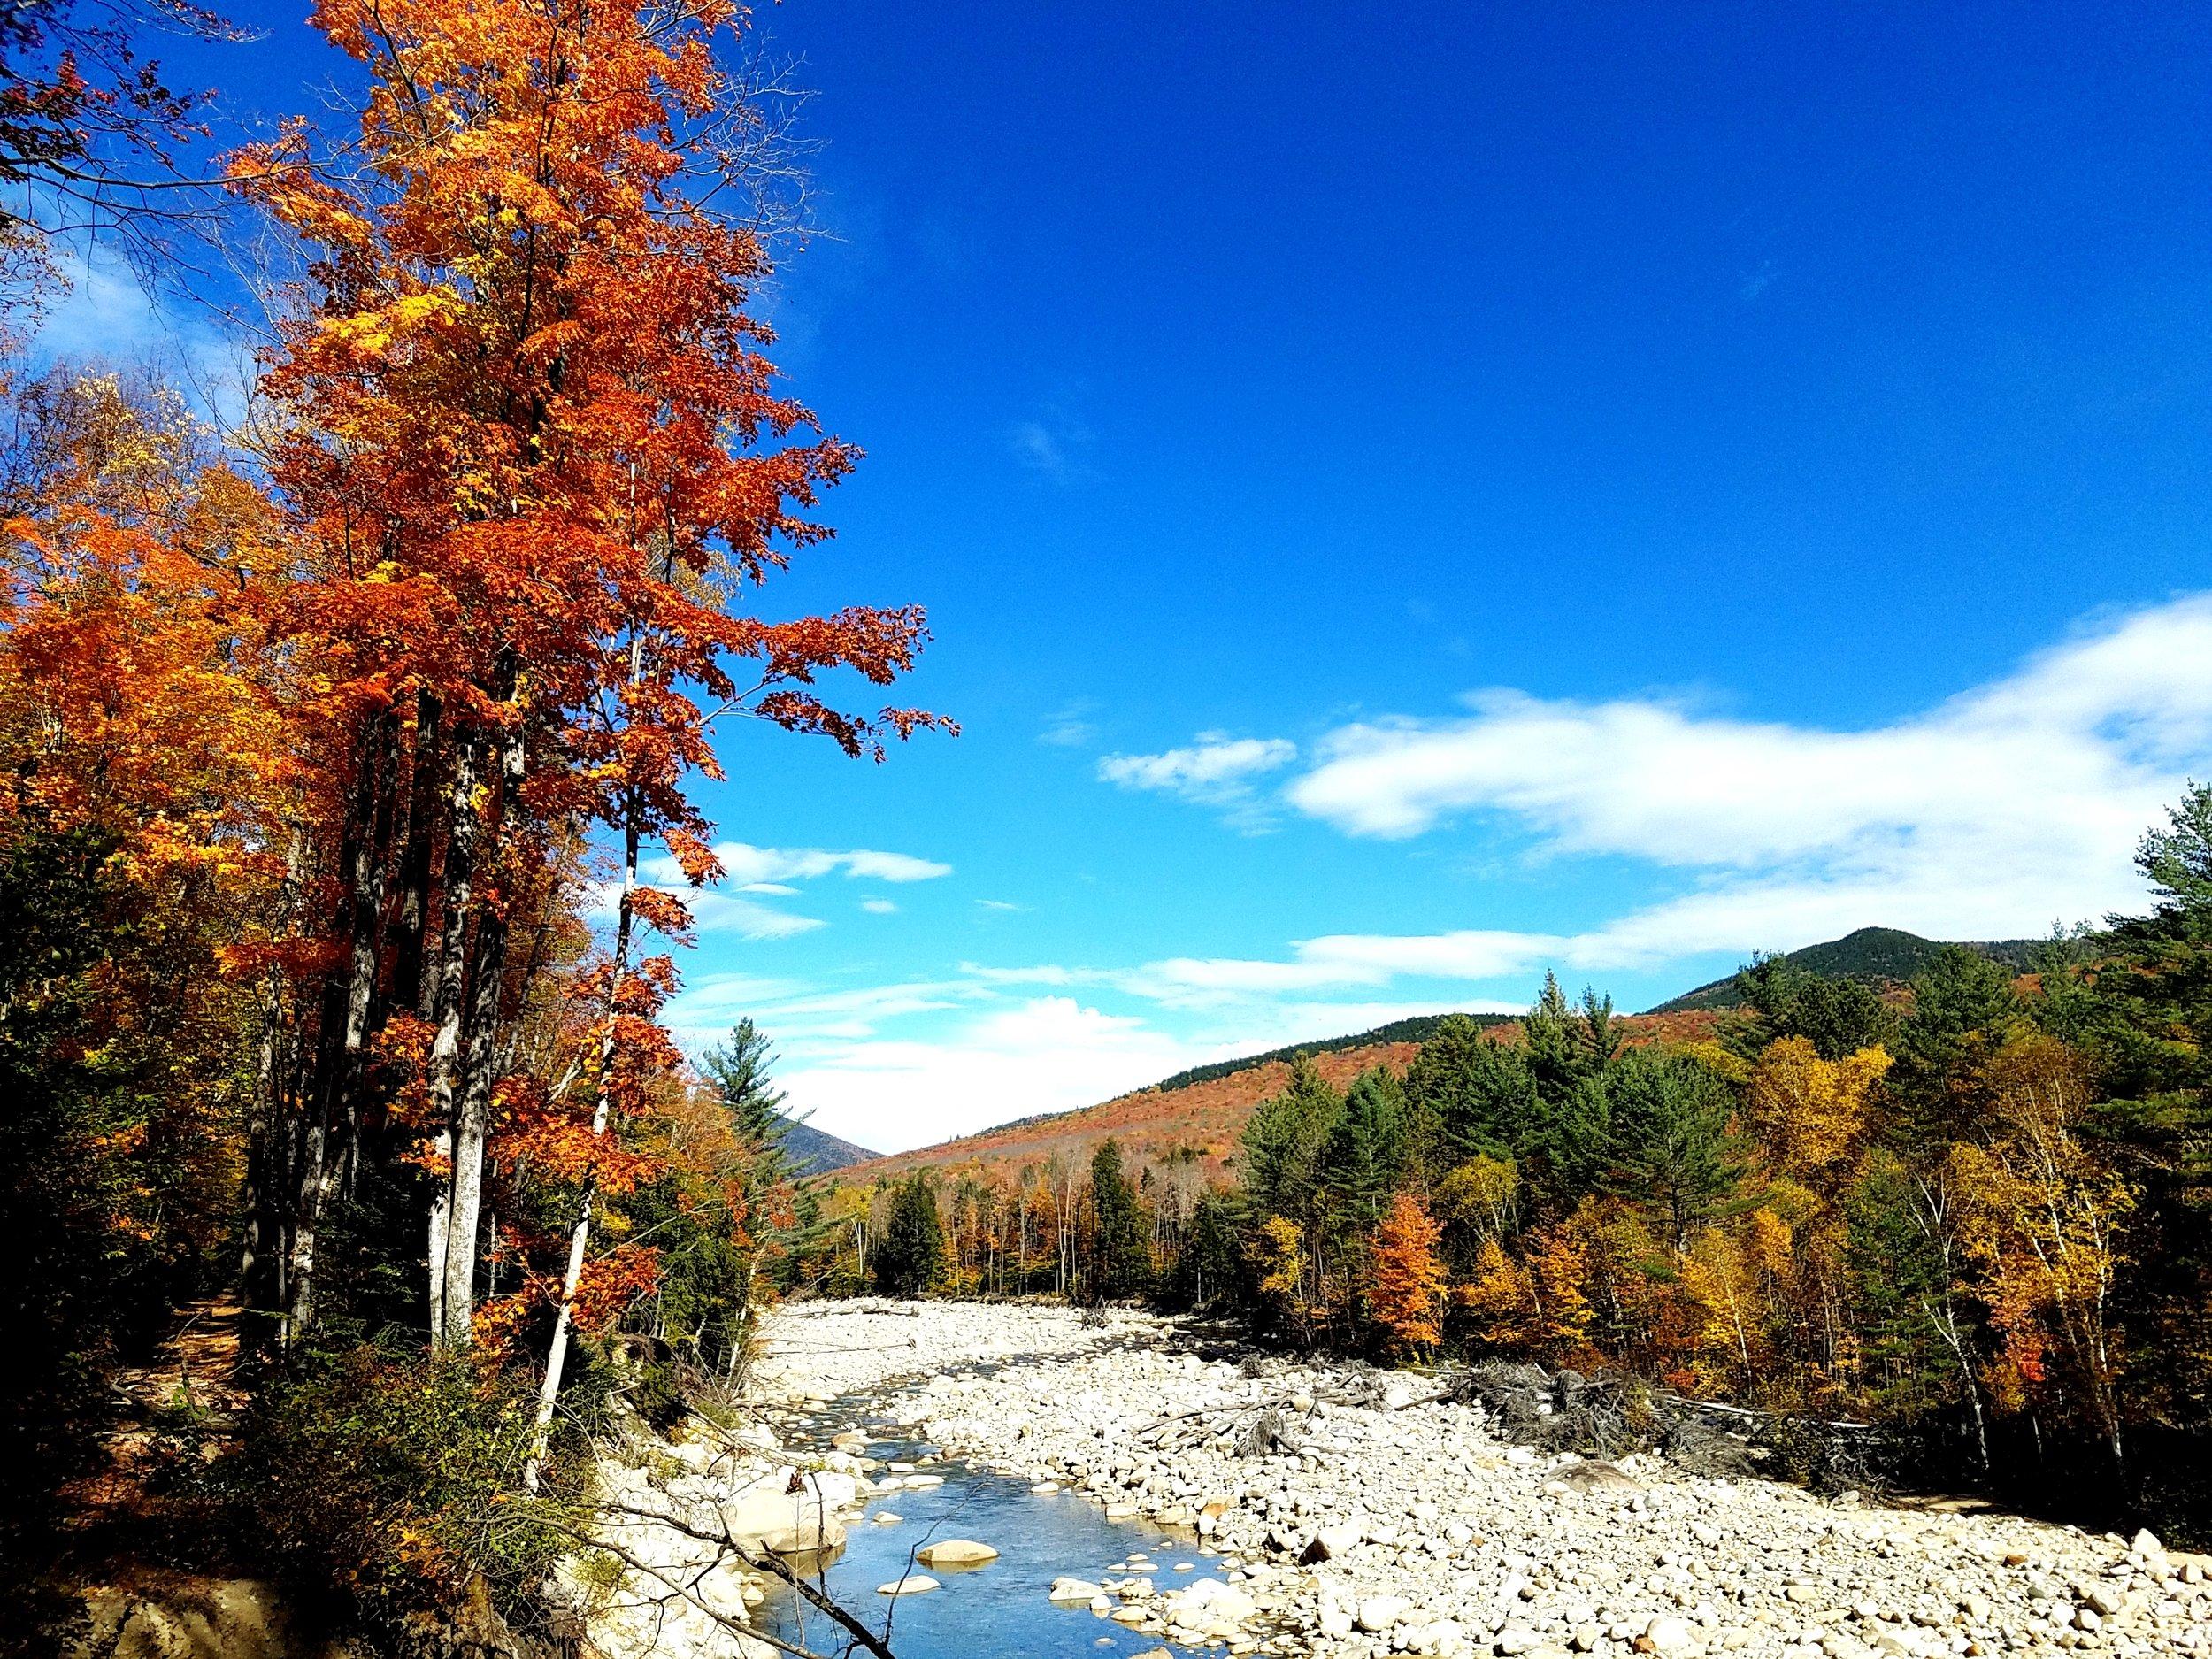 Pemigewasset River Oct 2016.jpg